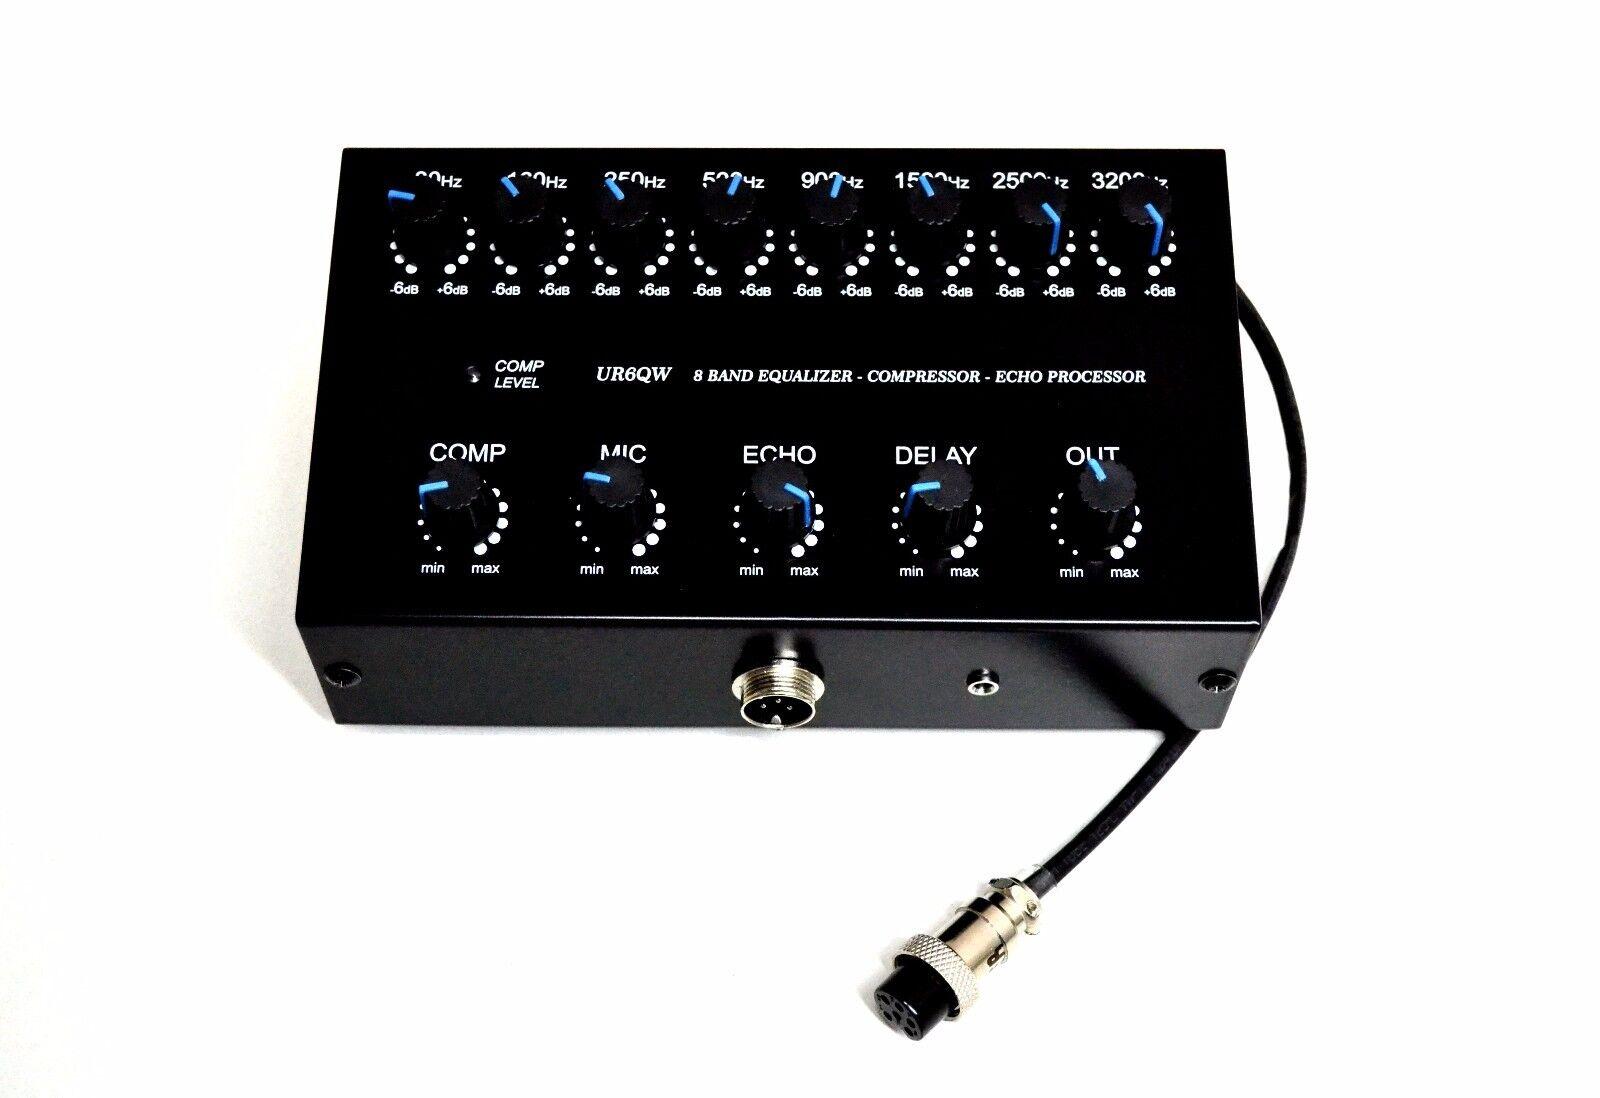 hight resolution of 8 band sound equalizer echo compressor to ranger rci 2950 2970 2995 cb radio for sale